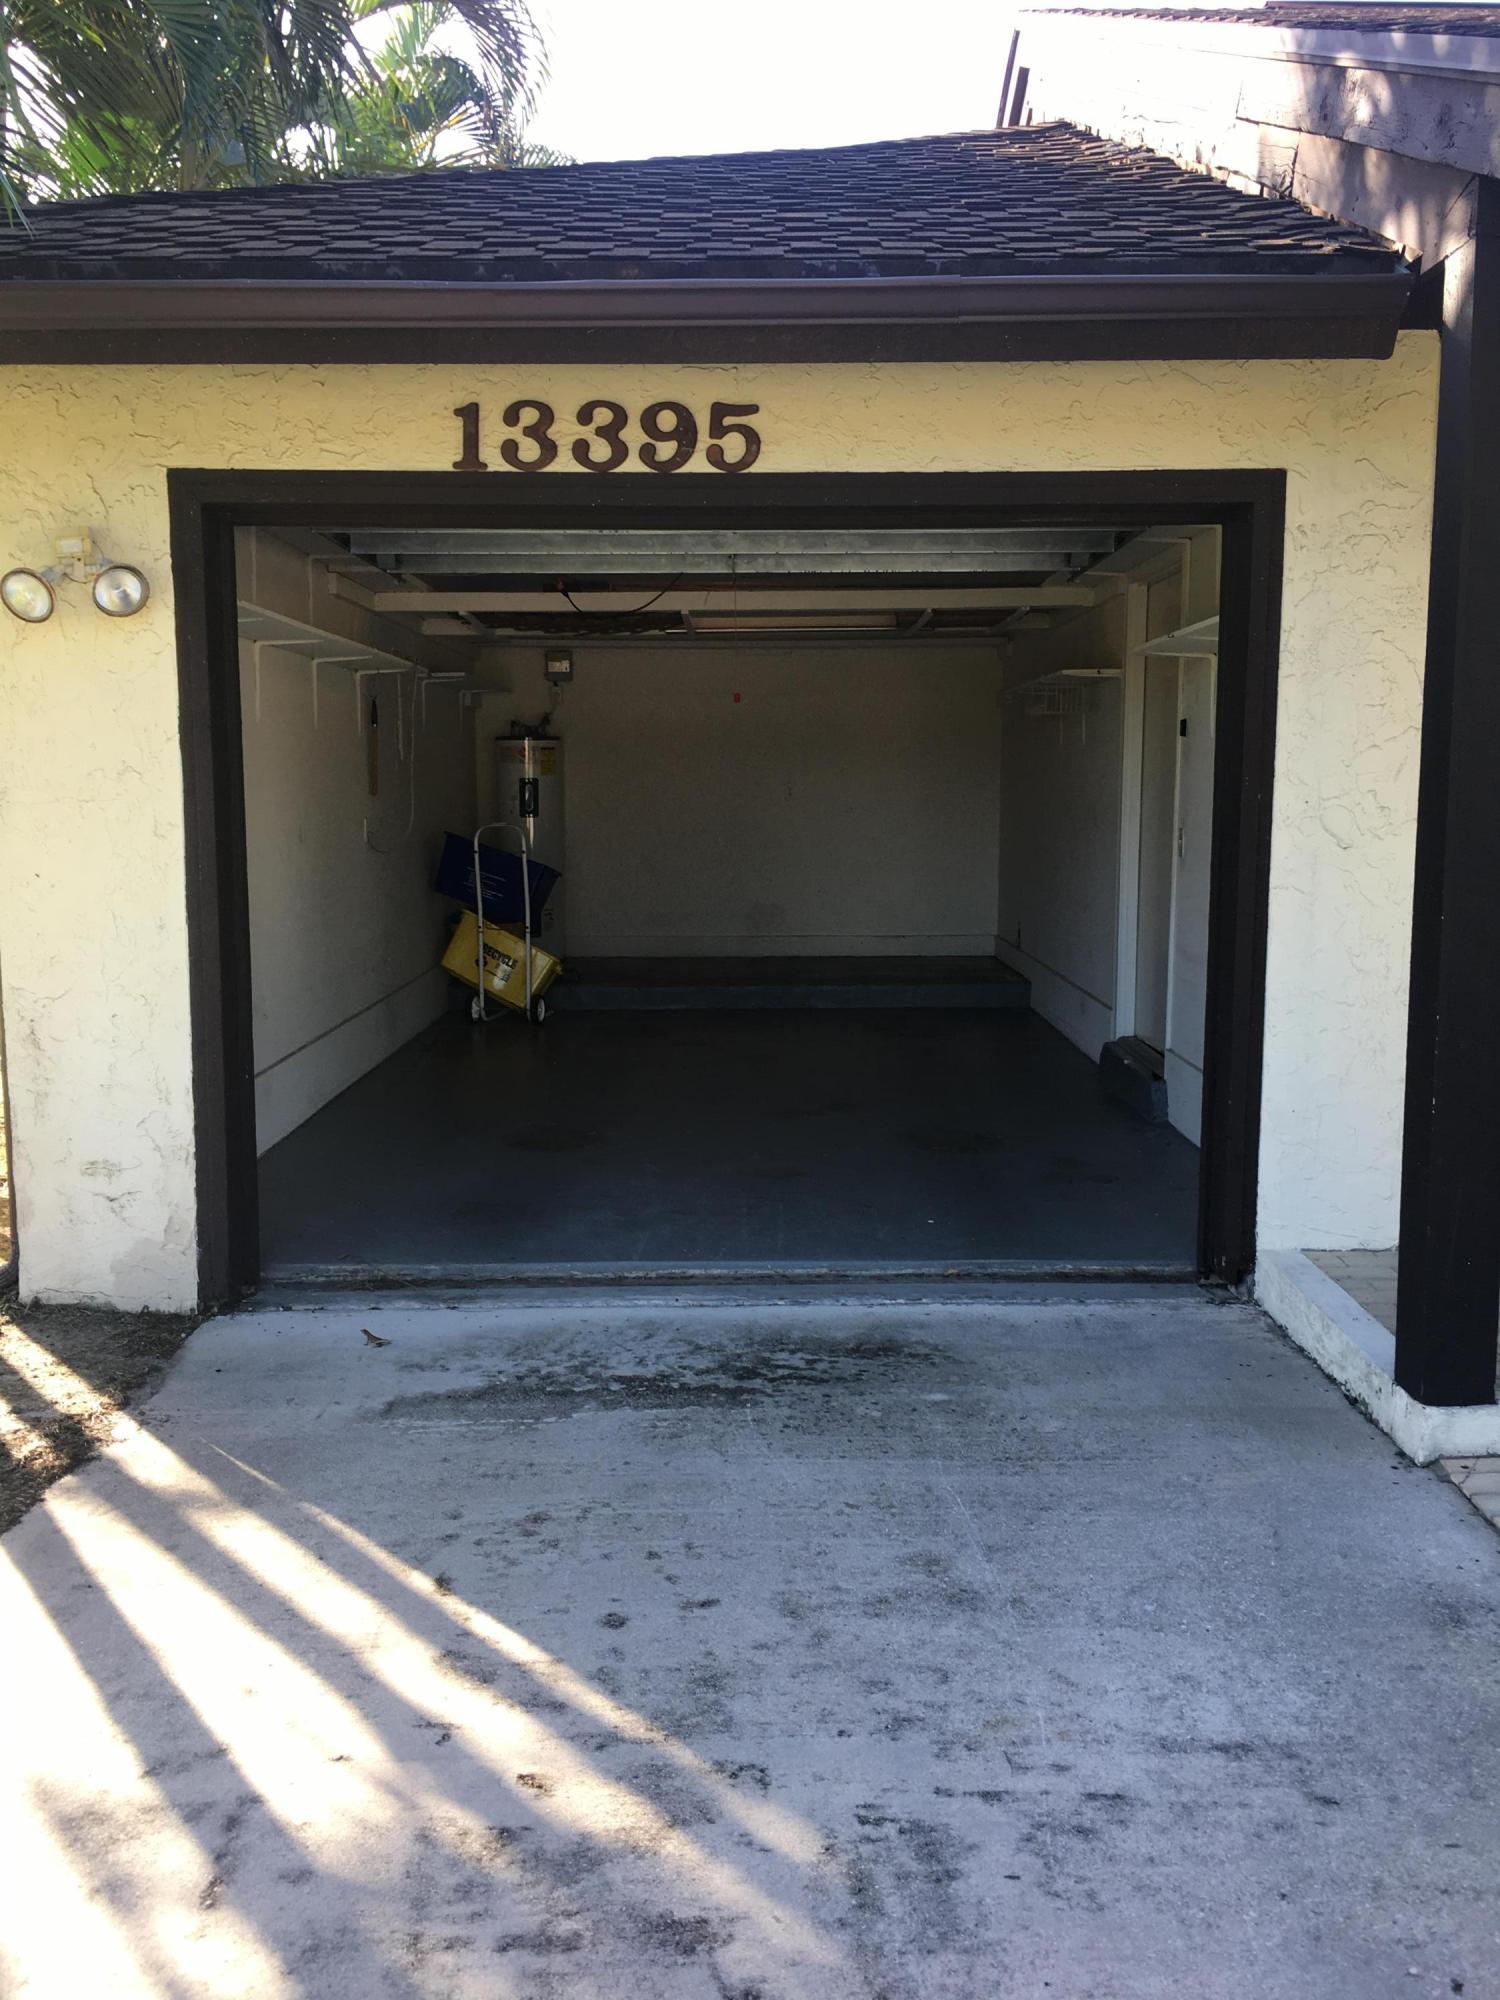 13395 Crosspointe Drive, Palm Beach Gardens, Florida 33418, 2 Bedrooms Bedrooms, ,2 BathroomsBathrooms,A,Single family,Crosspointe,RX-10474819